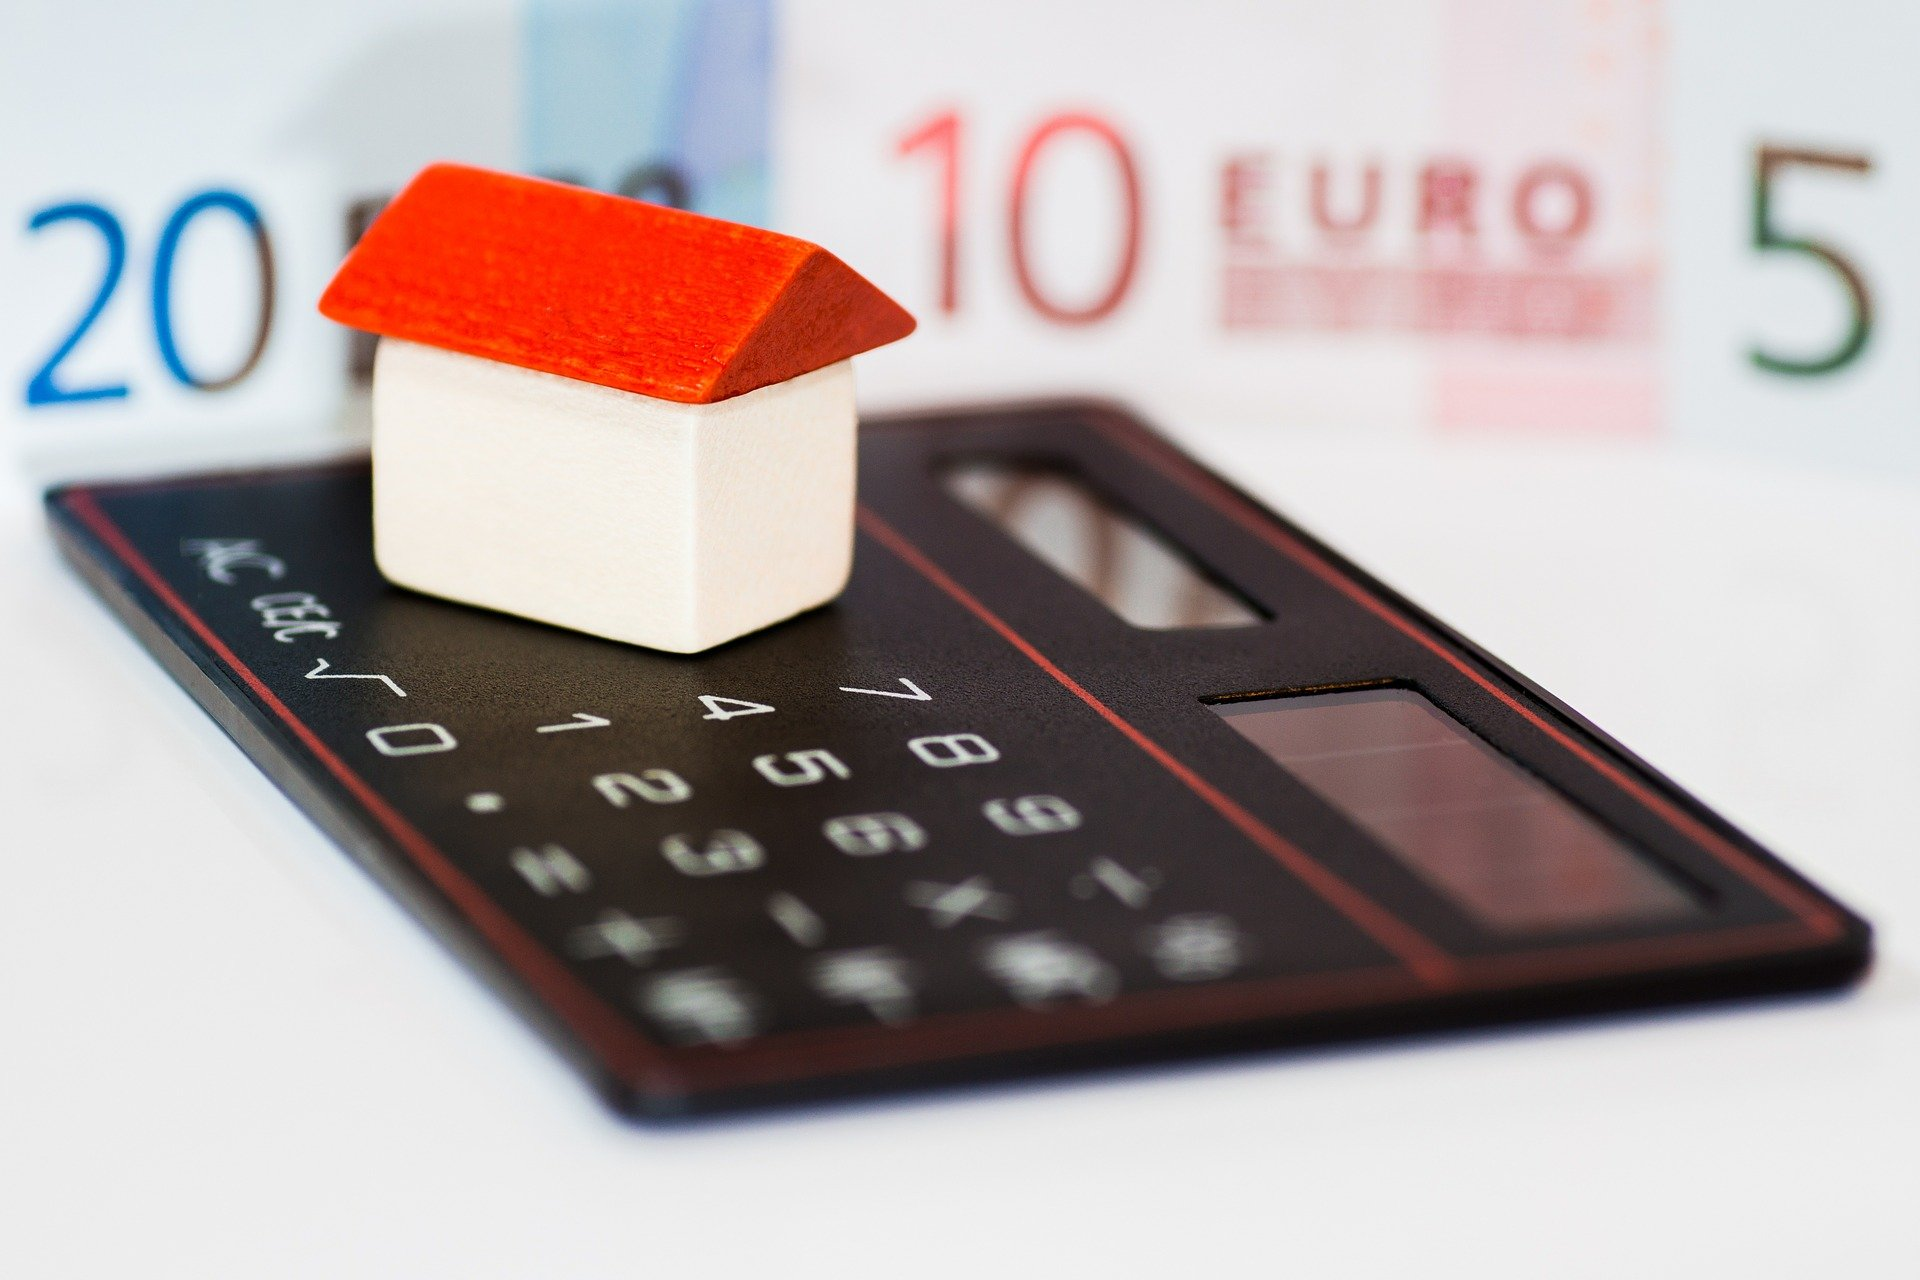 Vermögenswirksame Leistungen en Allemagne (VWL) - comment gagner 40 € de plus